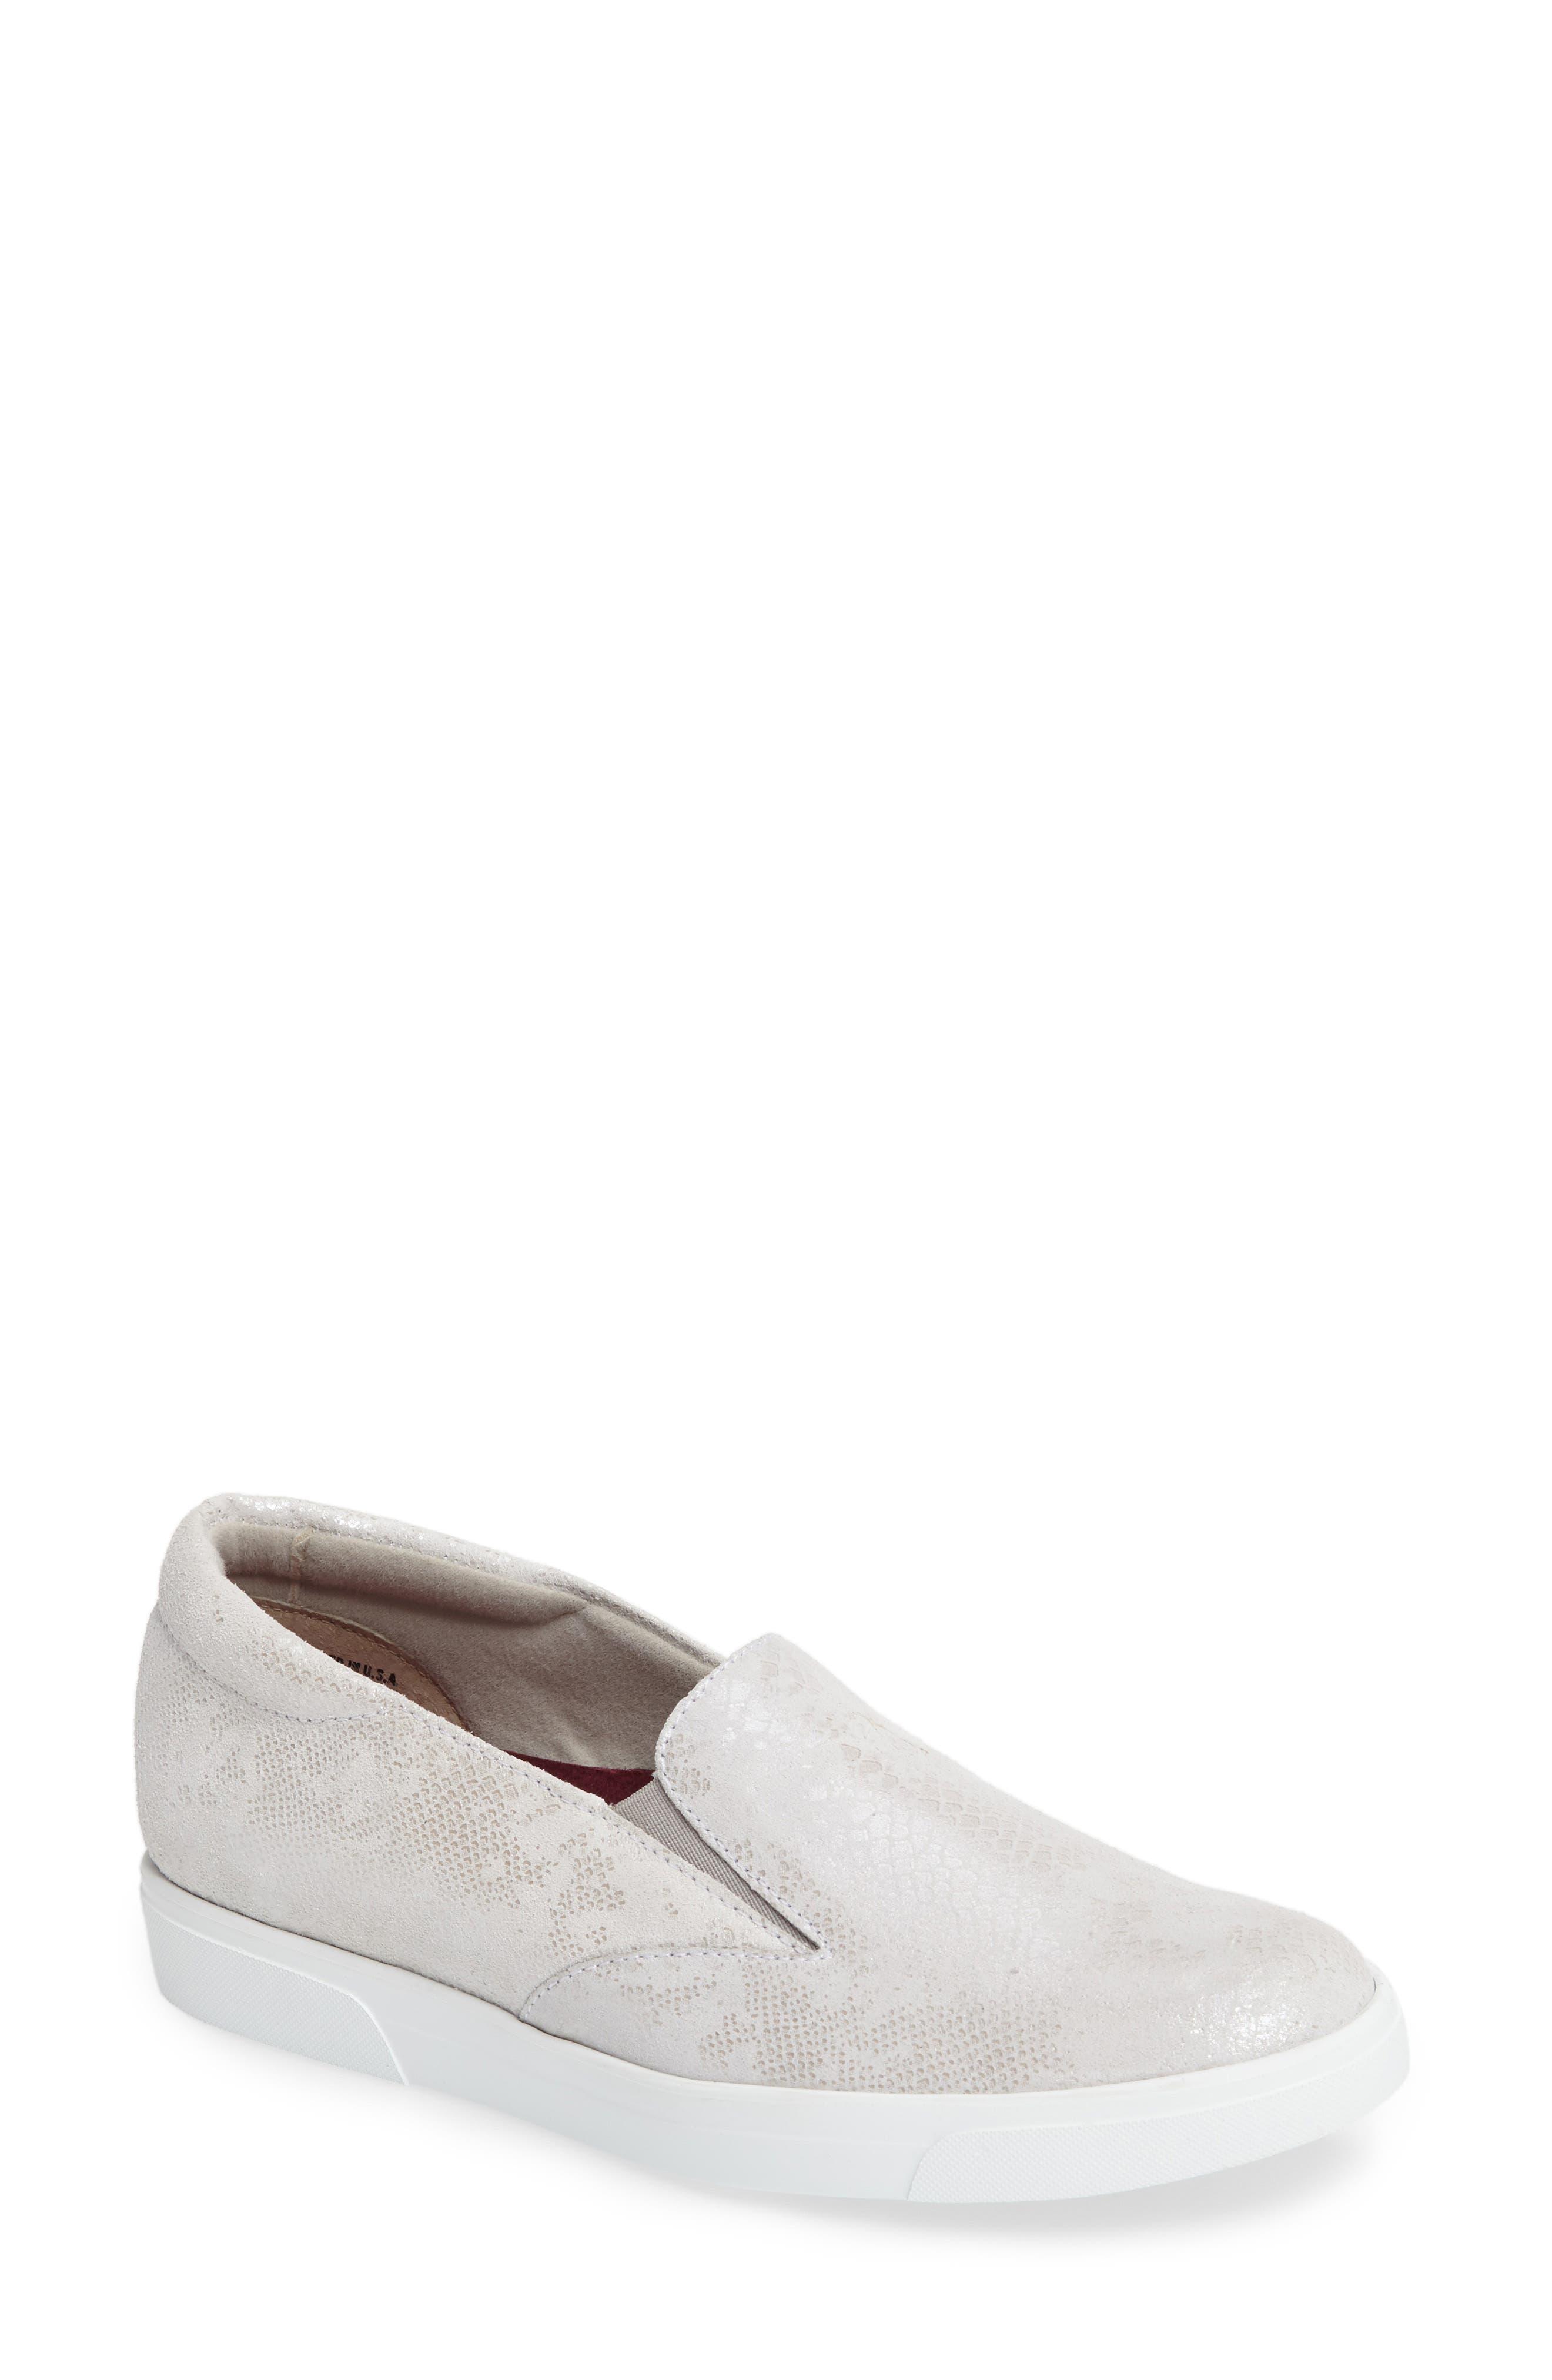 Munro Lulu Slip-On Sneaker, WW - White